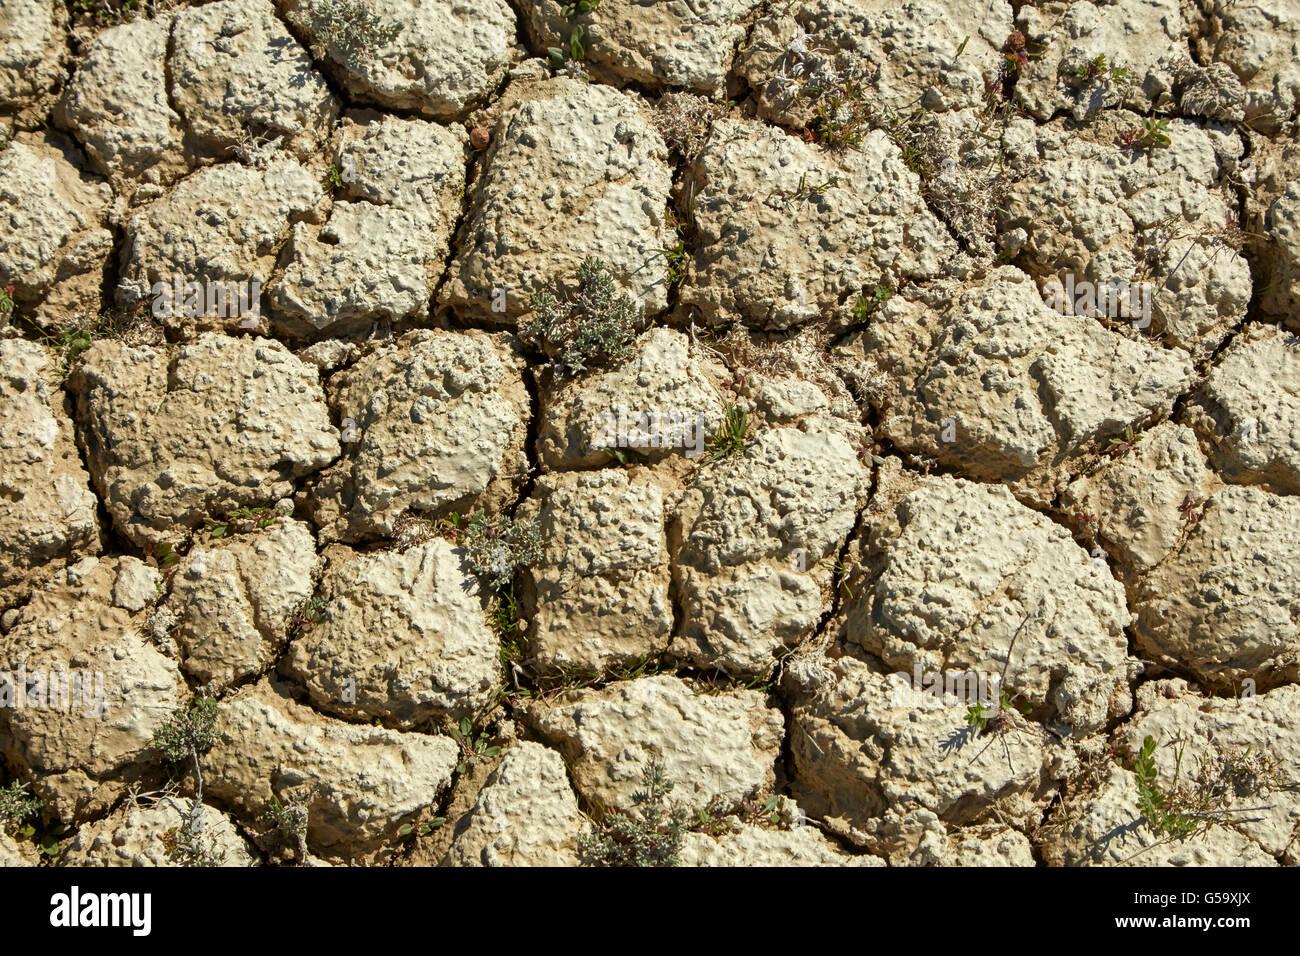 Dry cracked mud, Bannockburn Sluicings, near Cromwell, Central Otago, South Island, New Zealand - Stock Image